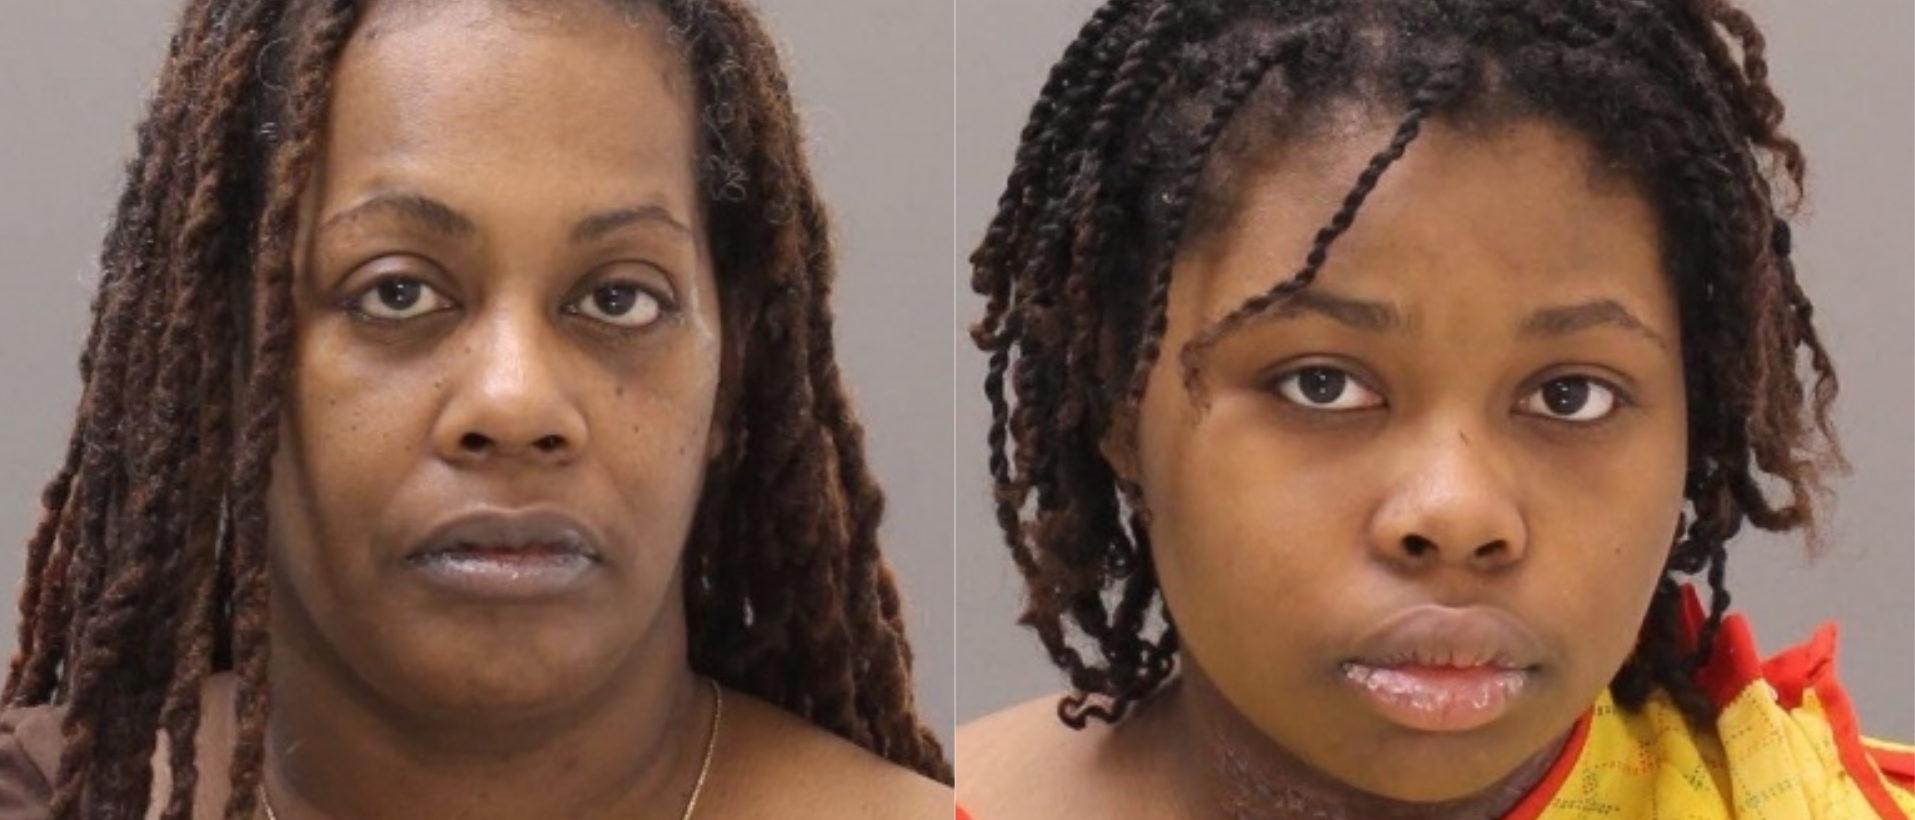 Shana and Dominique Decree via Bucks County District Attorneys Office